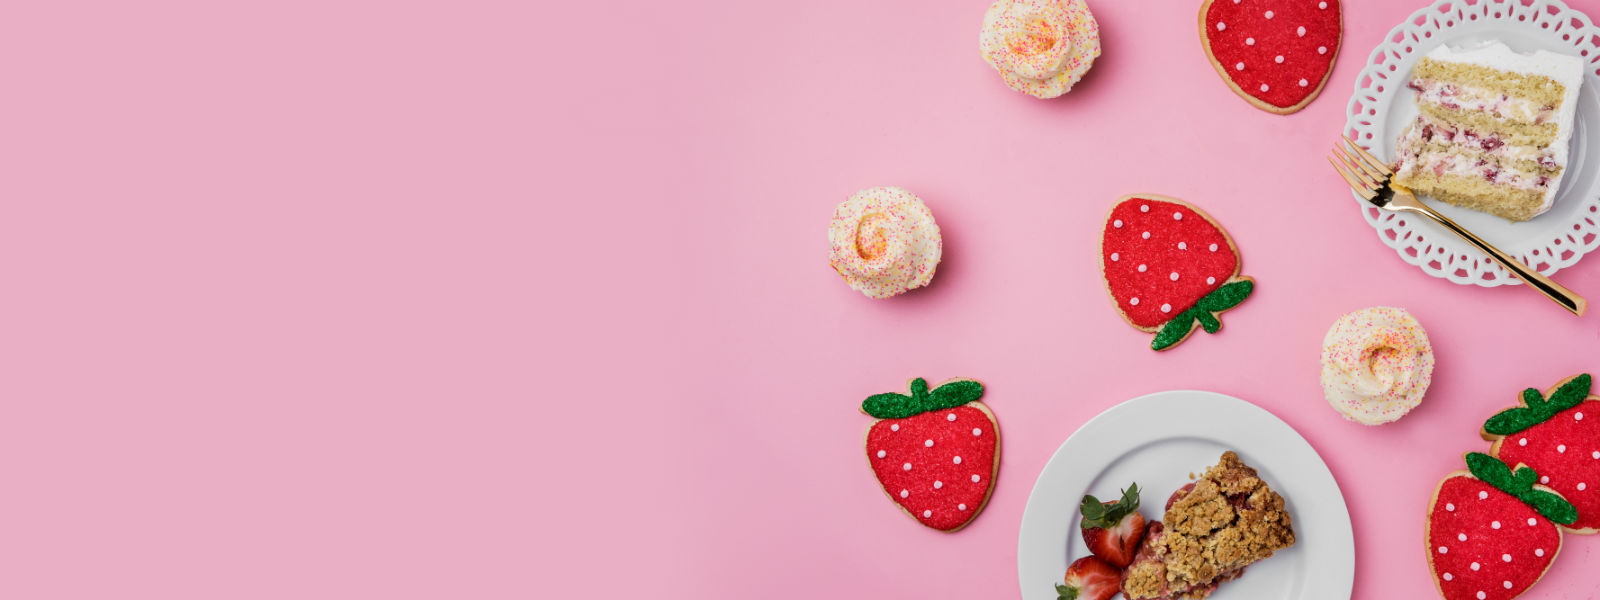 strawberry-season-banner.jpg